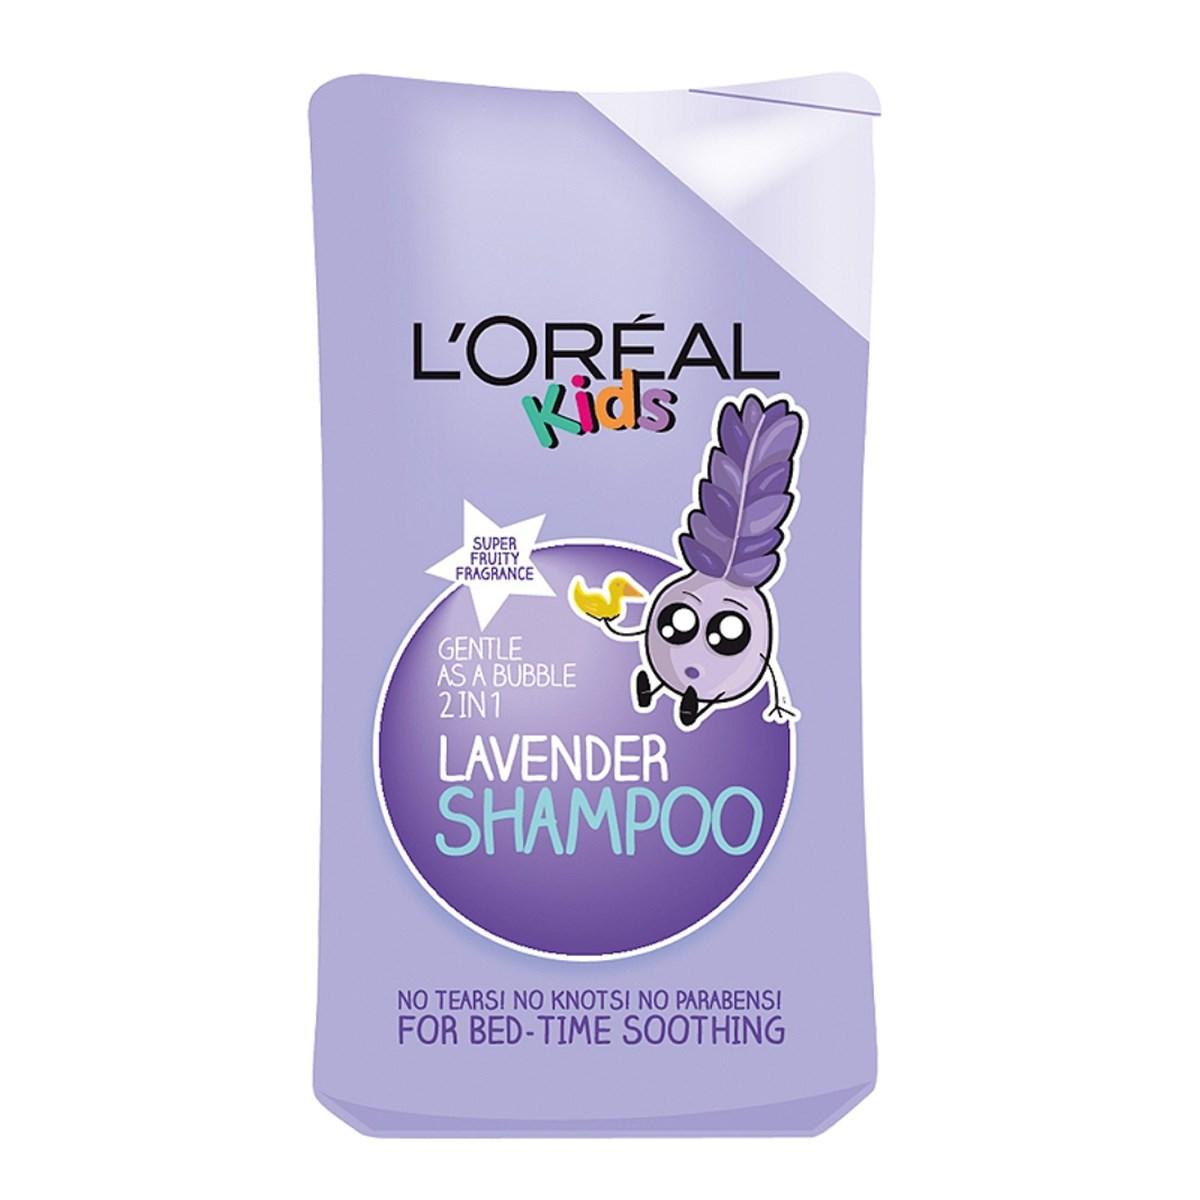 L'Oreal Paris Kids Soothing Lavender Shampoo